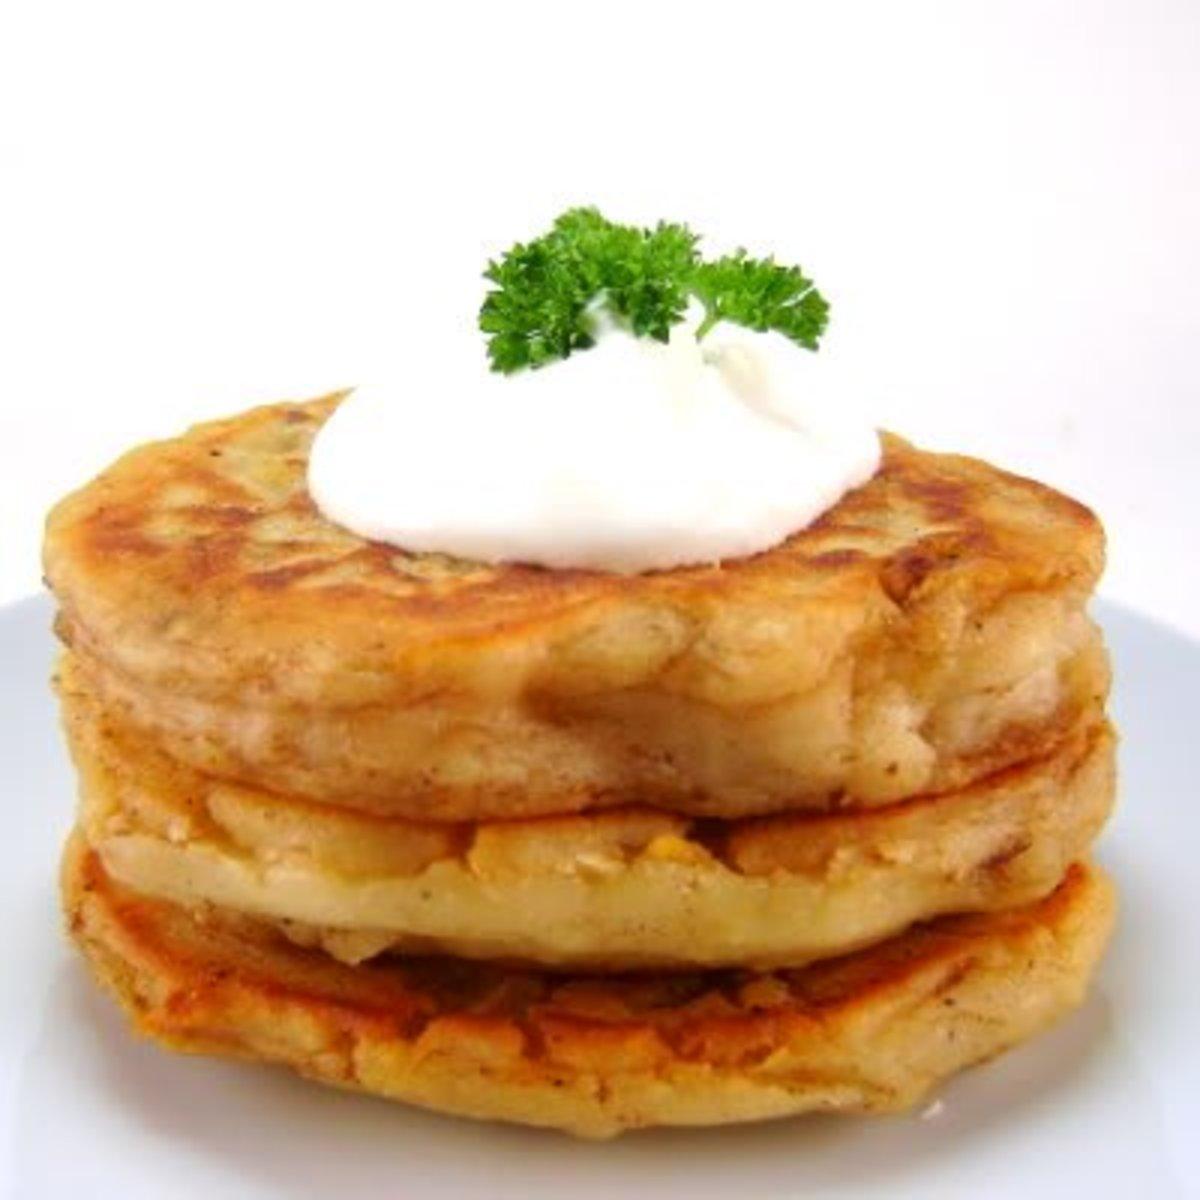 How to Make Boxty, a Traditional Irish Potato Pancake Recipe